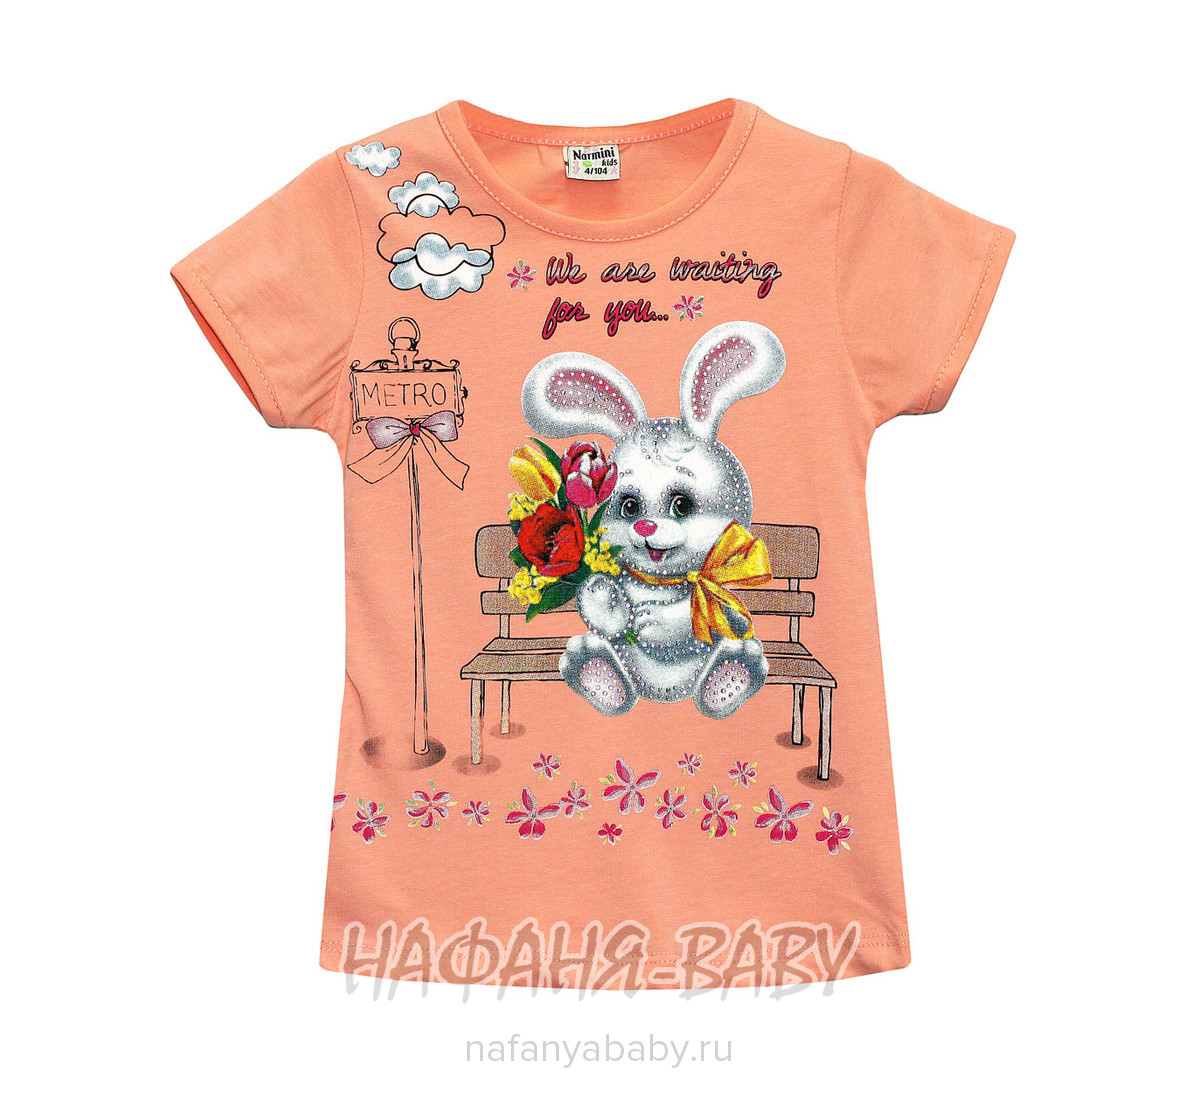 Детская футболка, артикул 5508 NARMINI арт: 5508, 1-4 года, цвет белый, оптом Турция